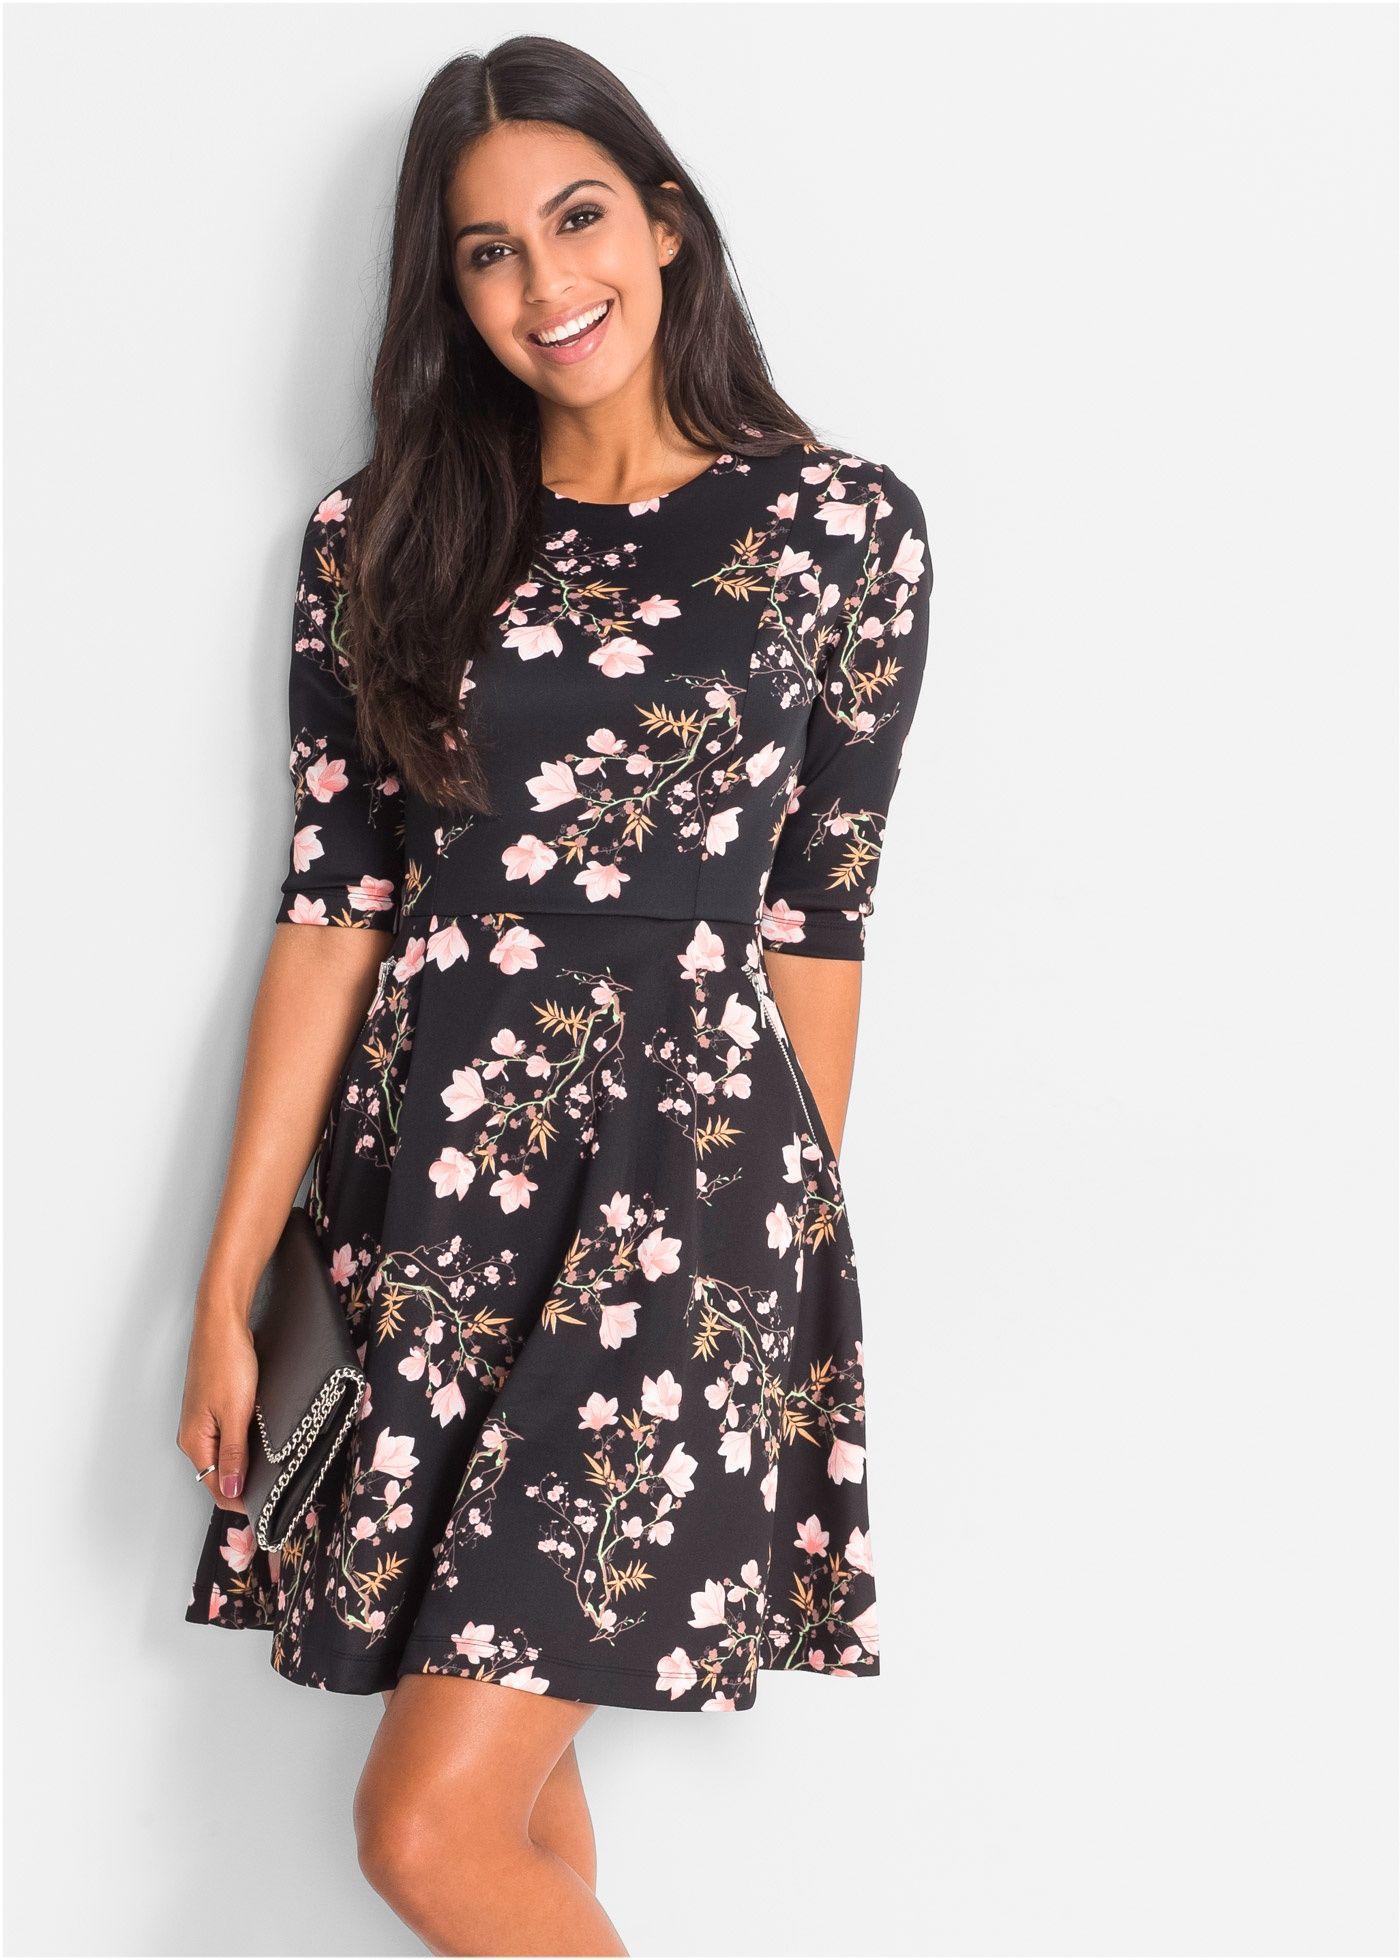 990a74dd1164cb Scuba-Kleid schwarz geblümt - BODYFLIRT jetzt im Online Shop von bonprix.de  ab   29